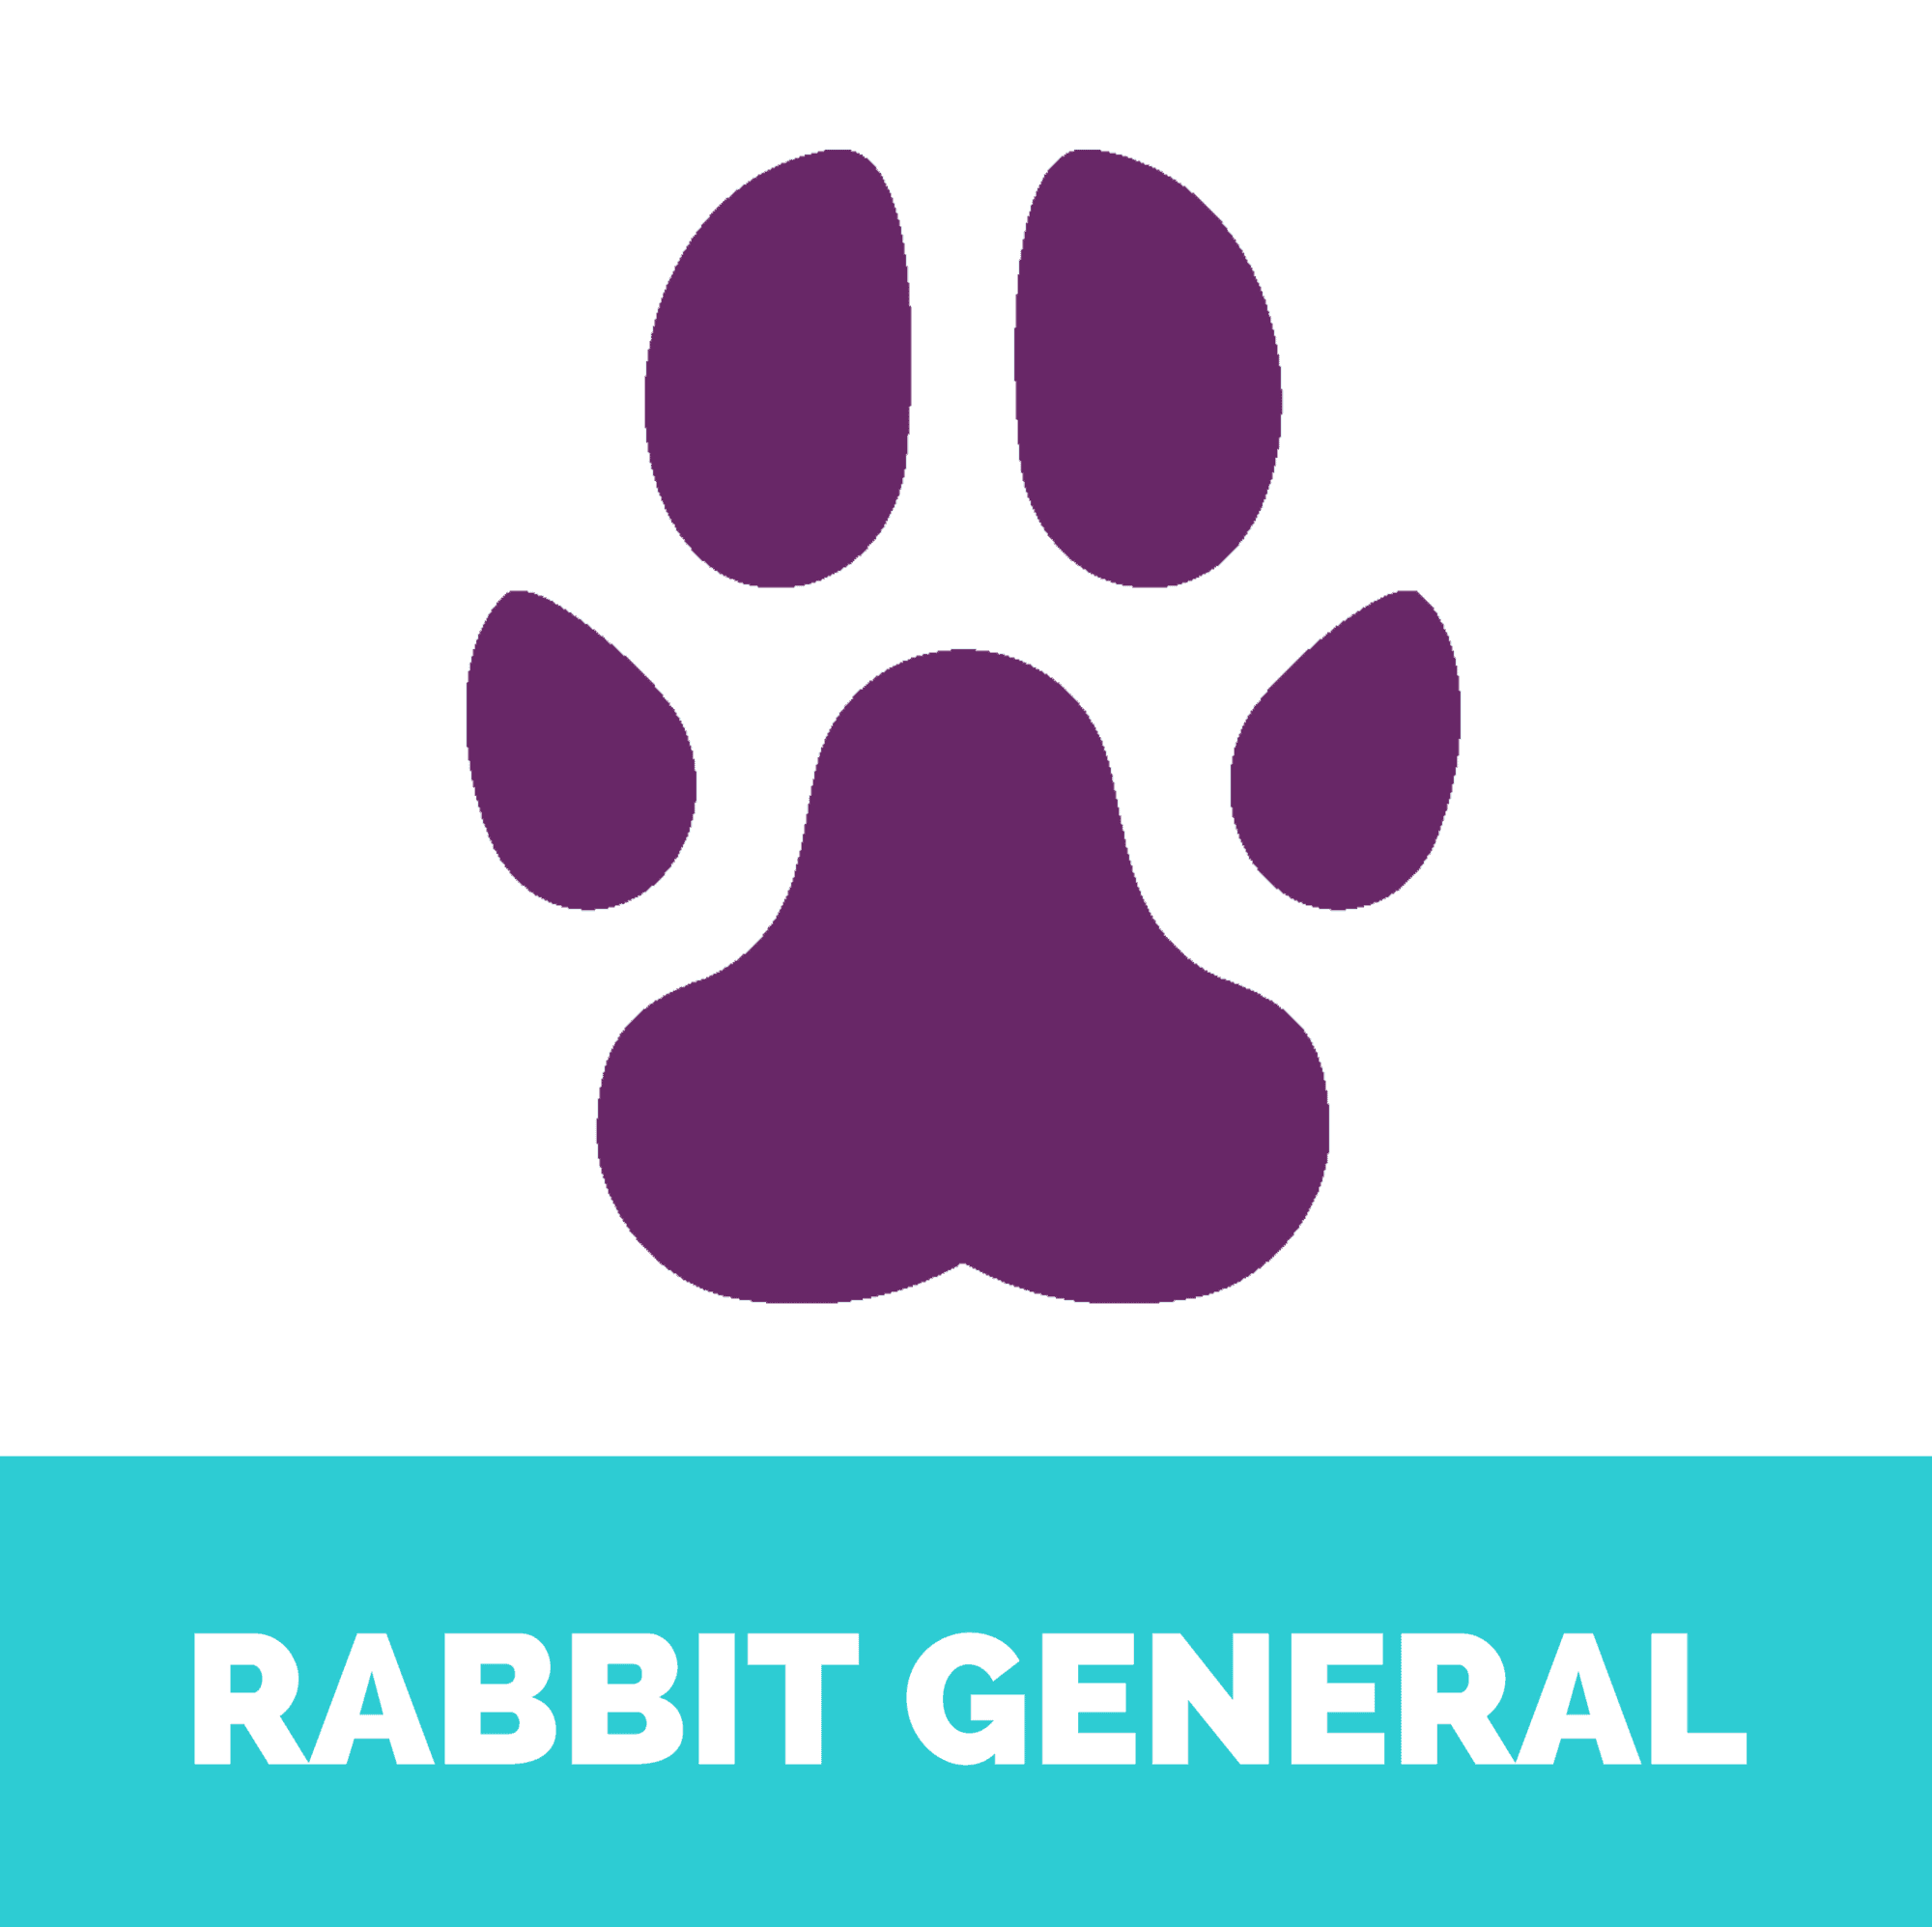 rabbit general